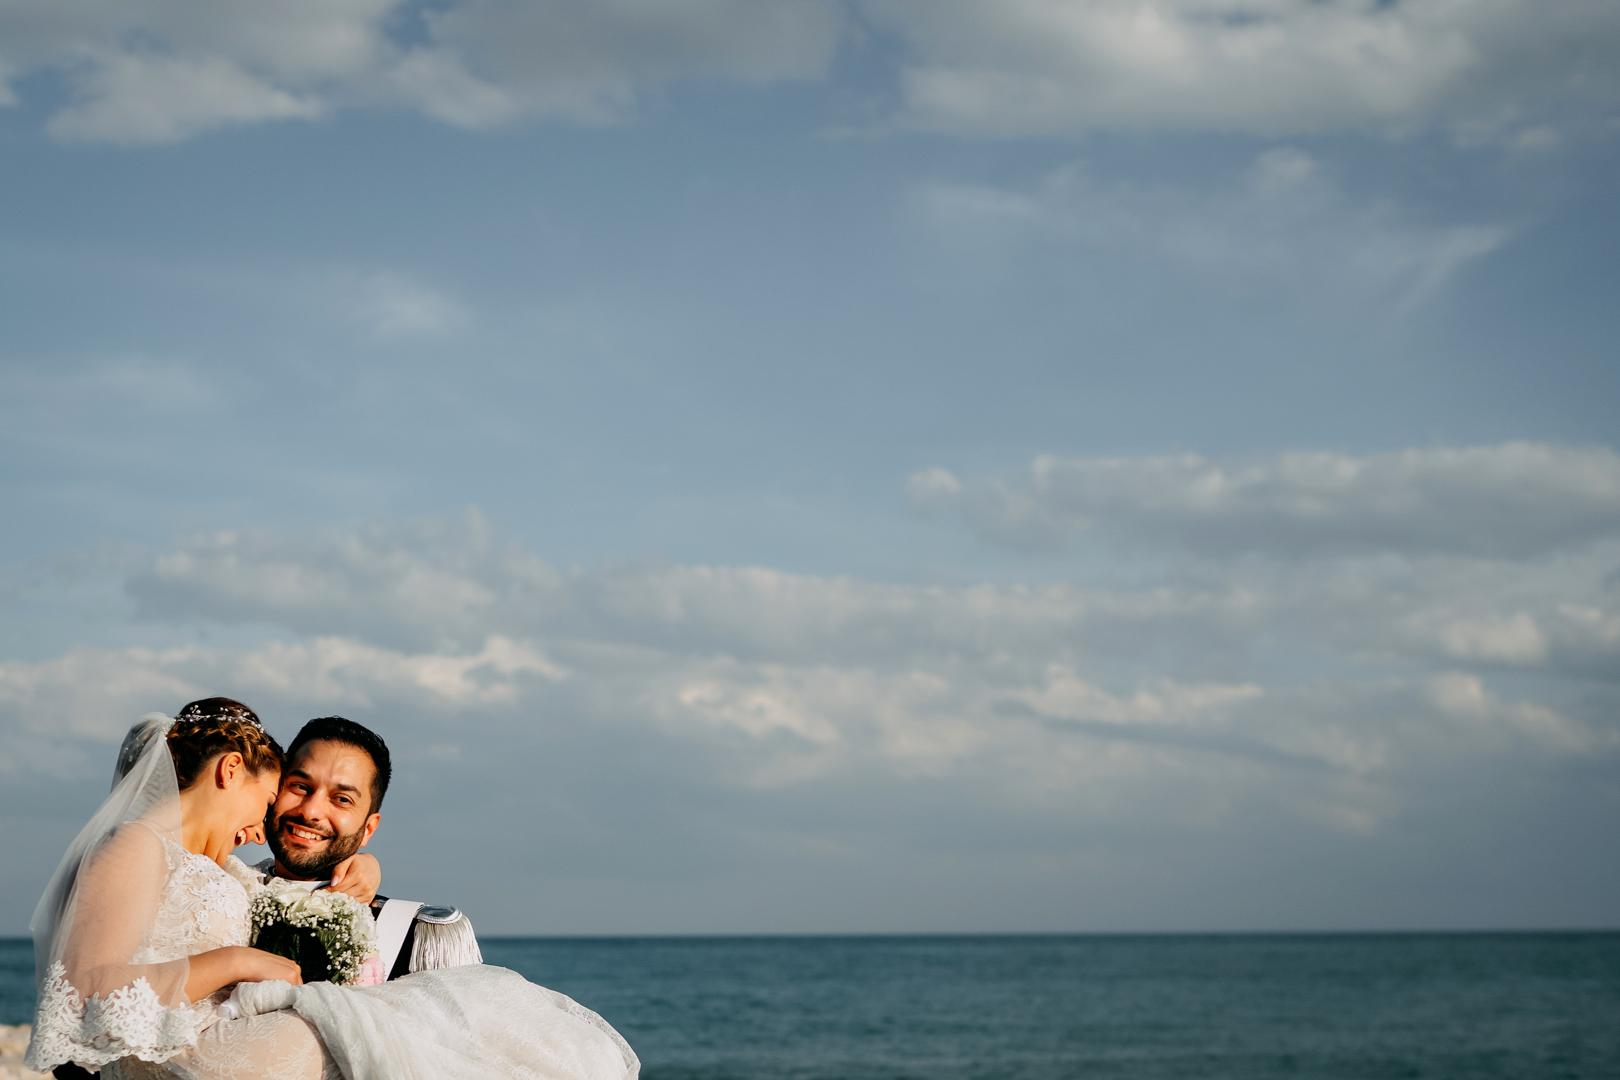 41 matrimonio-mare-peschici-mattinata-gargano-sposi-fotografo-gianni-lepore